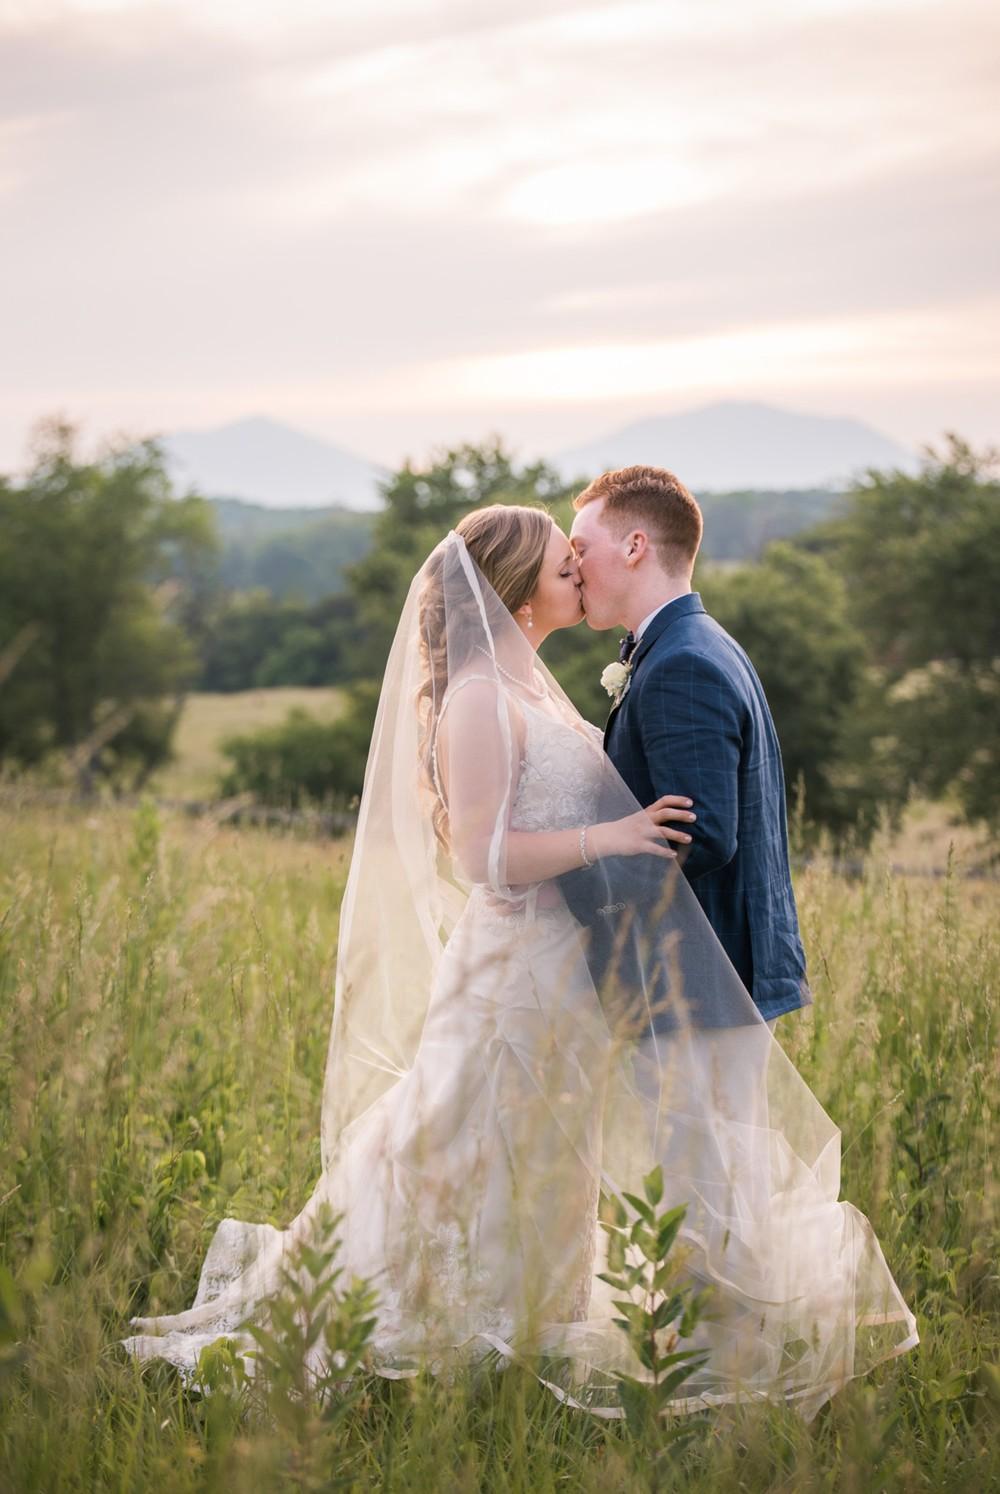 trivium_lynchburg_va_wedding_estate_wedding_photography_wedding_photographers (80).jpg